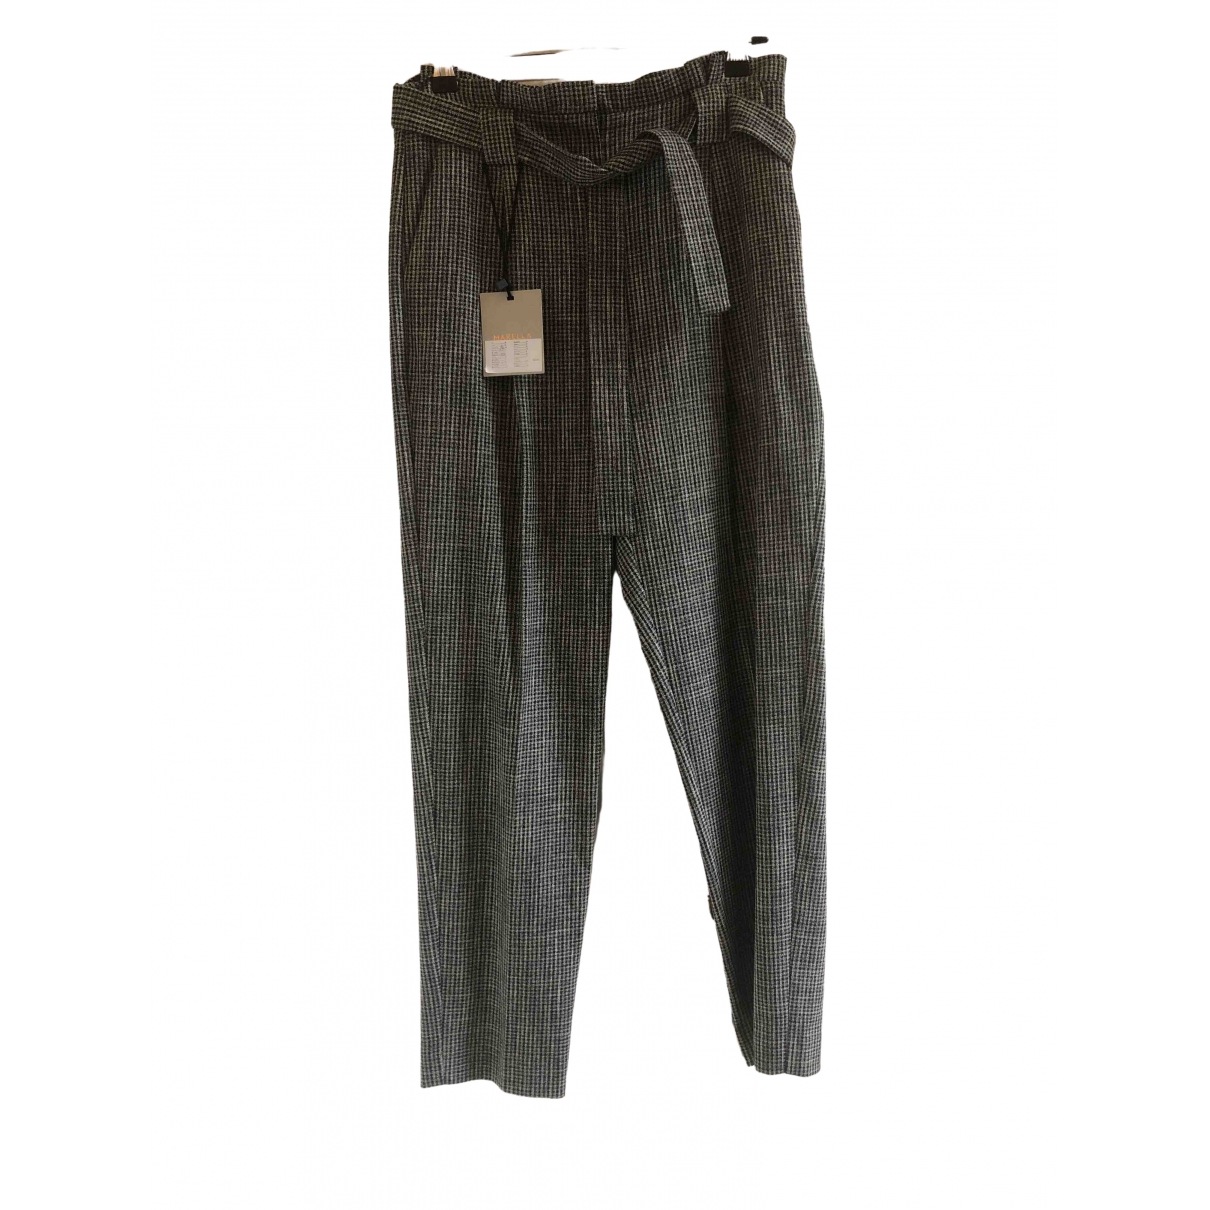 Marella \N Black Trousers for Women 38 IT